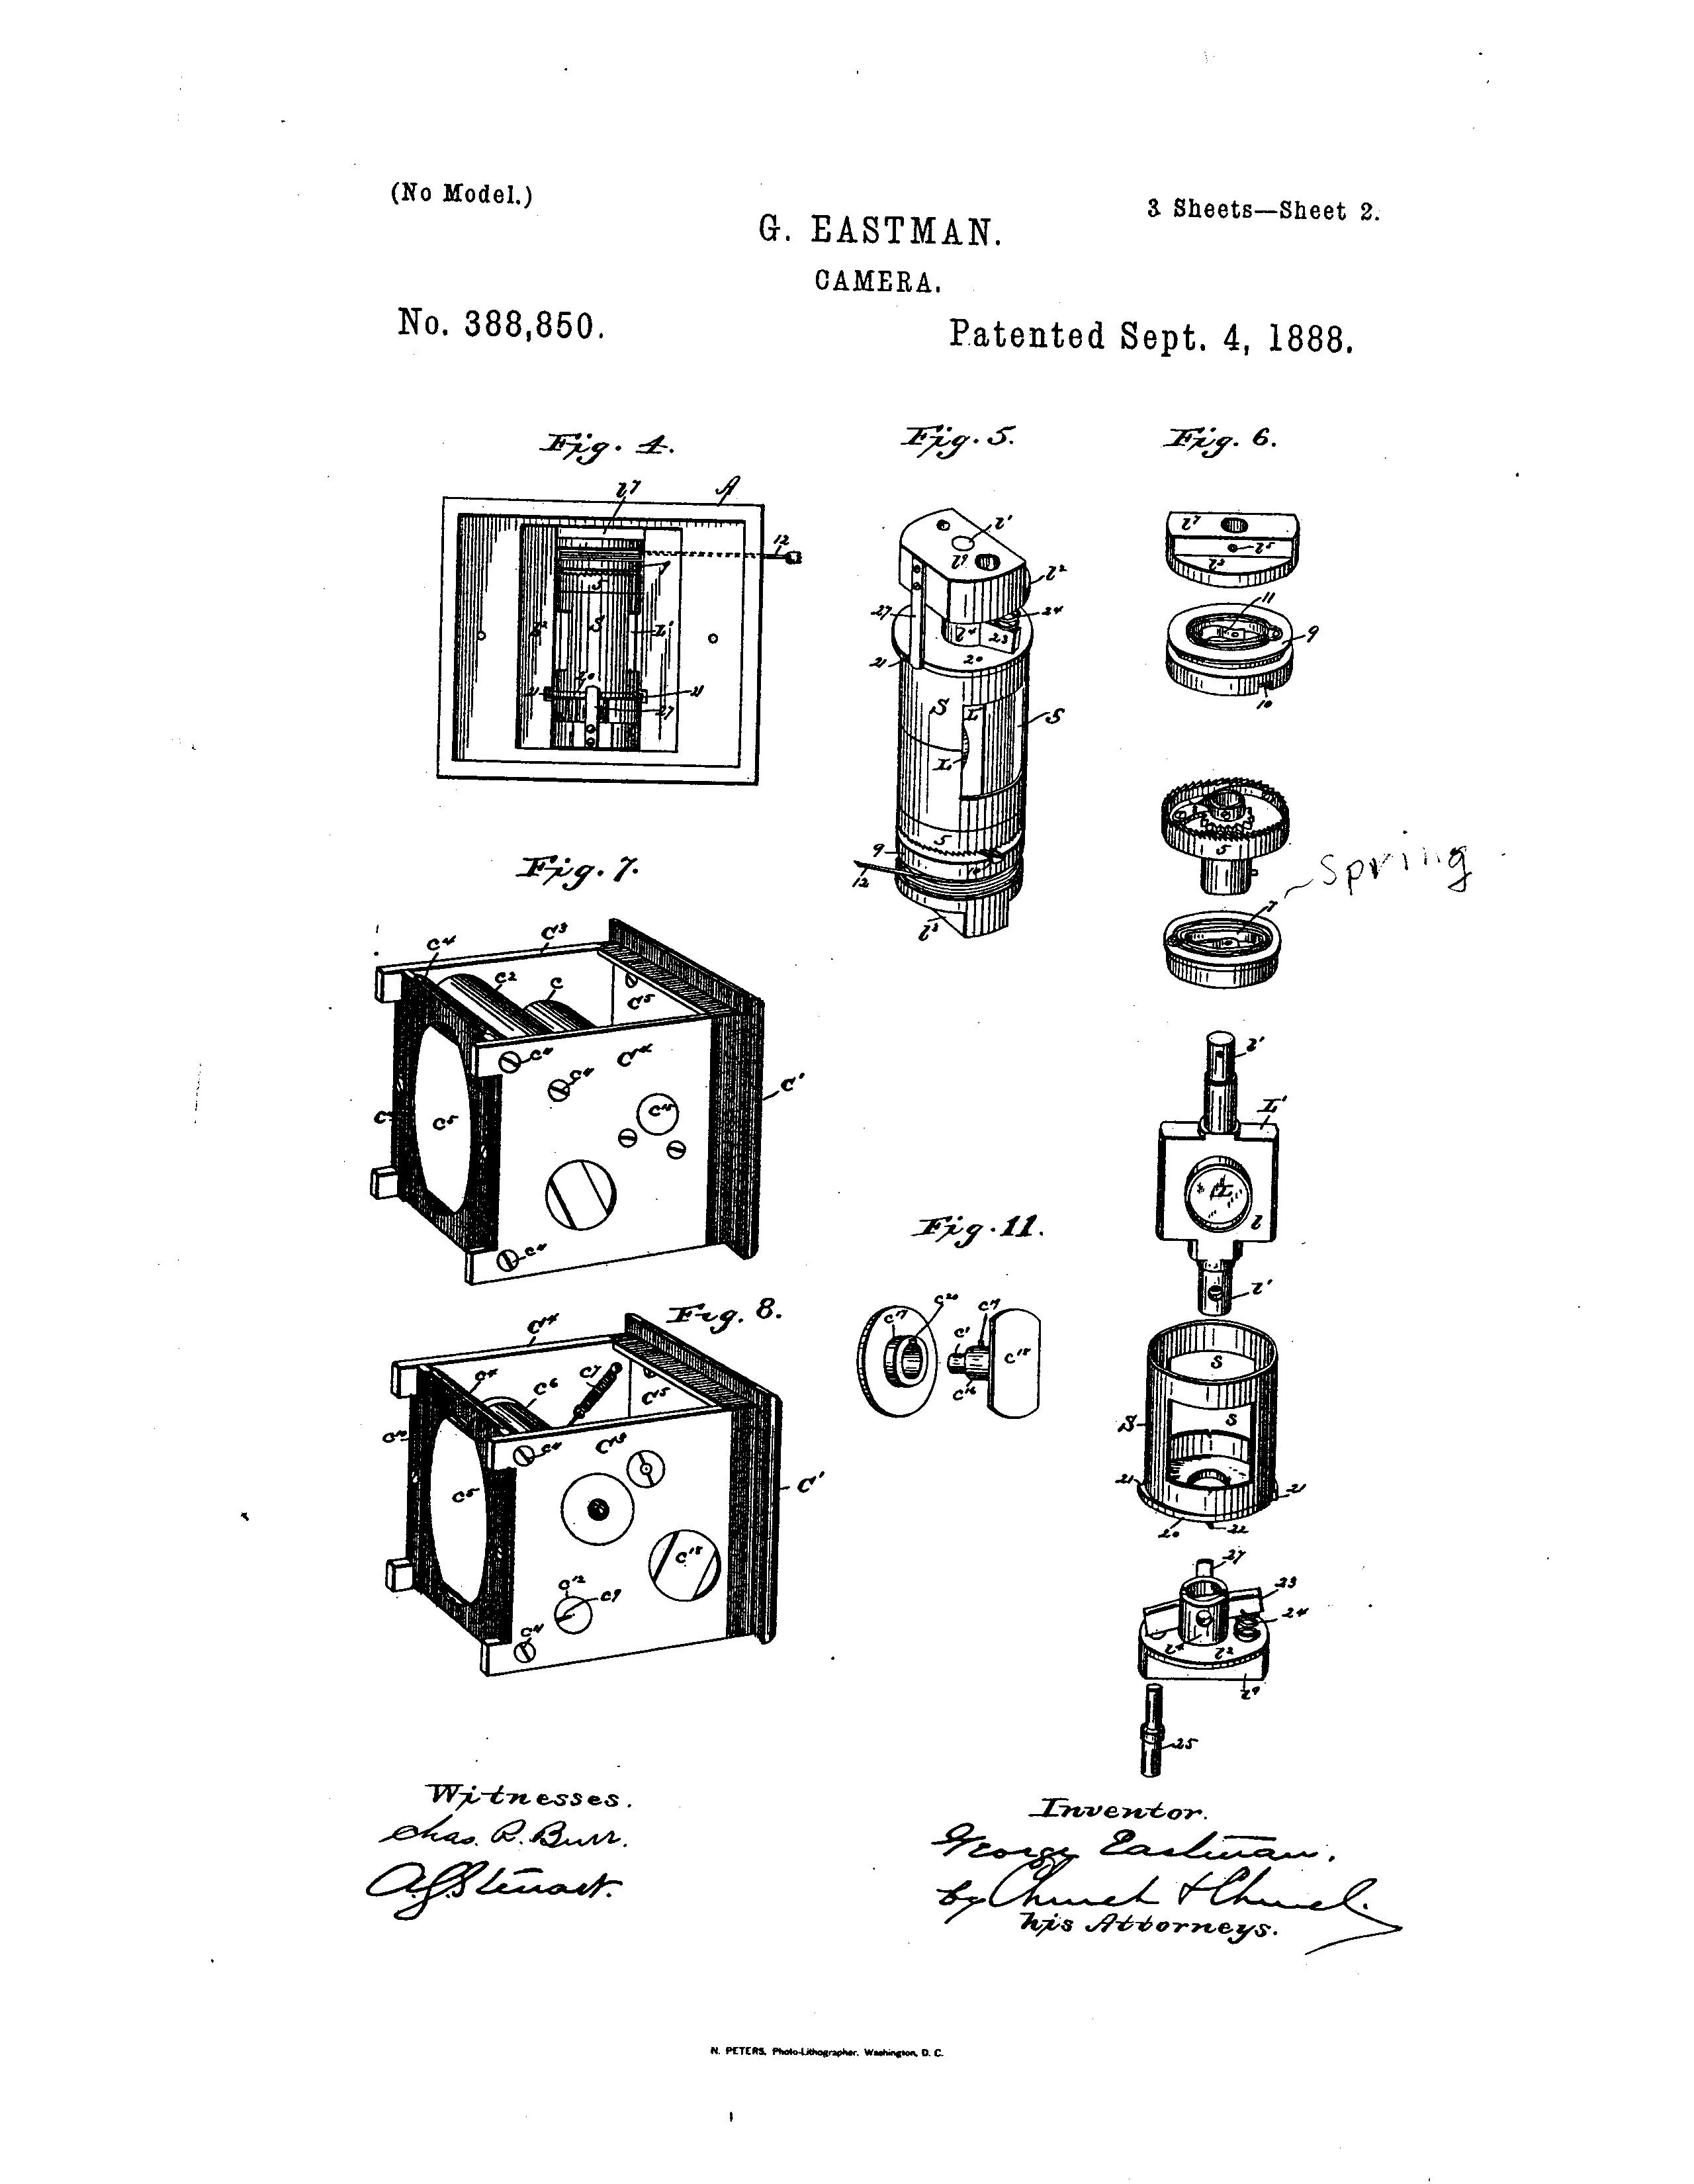 patent application number vs publication number